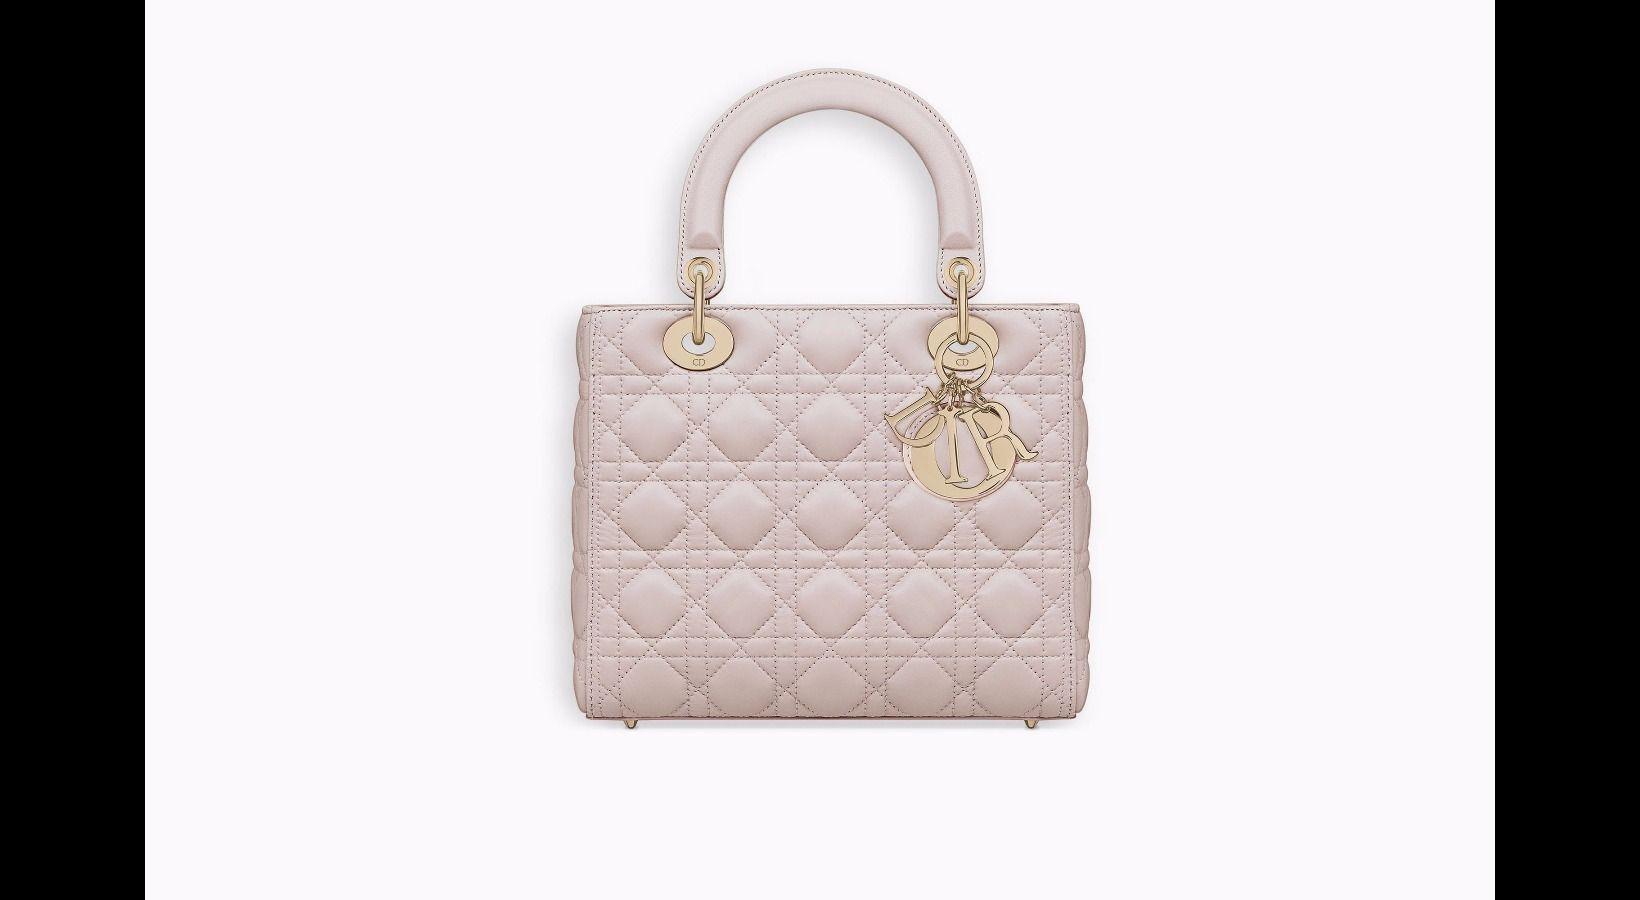 9ea9f2d32a40 Christian Dior Handbags Casual Style Lambskin Street Style 2WAY Plain  Handbags 5